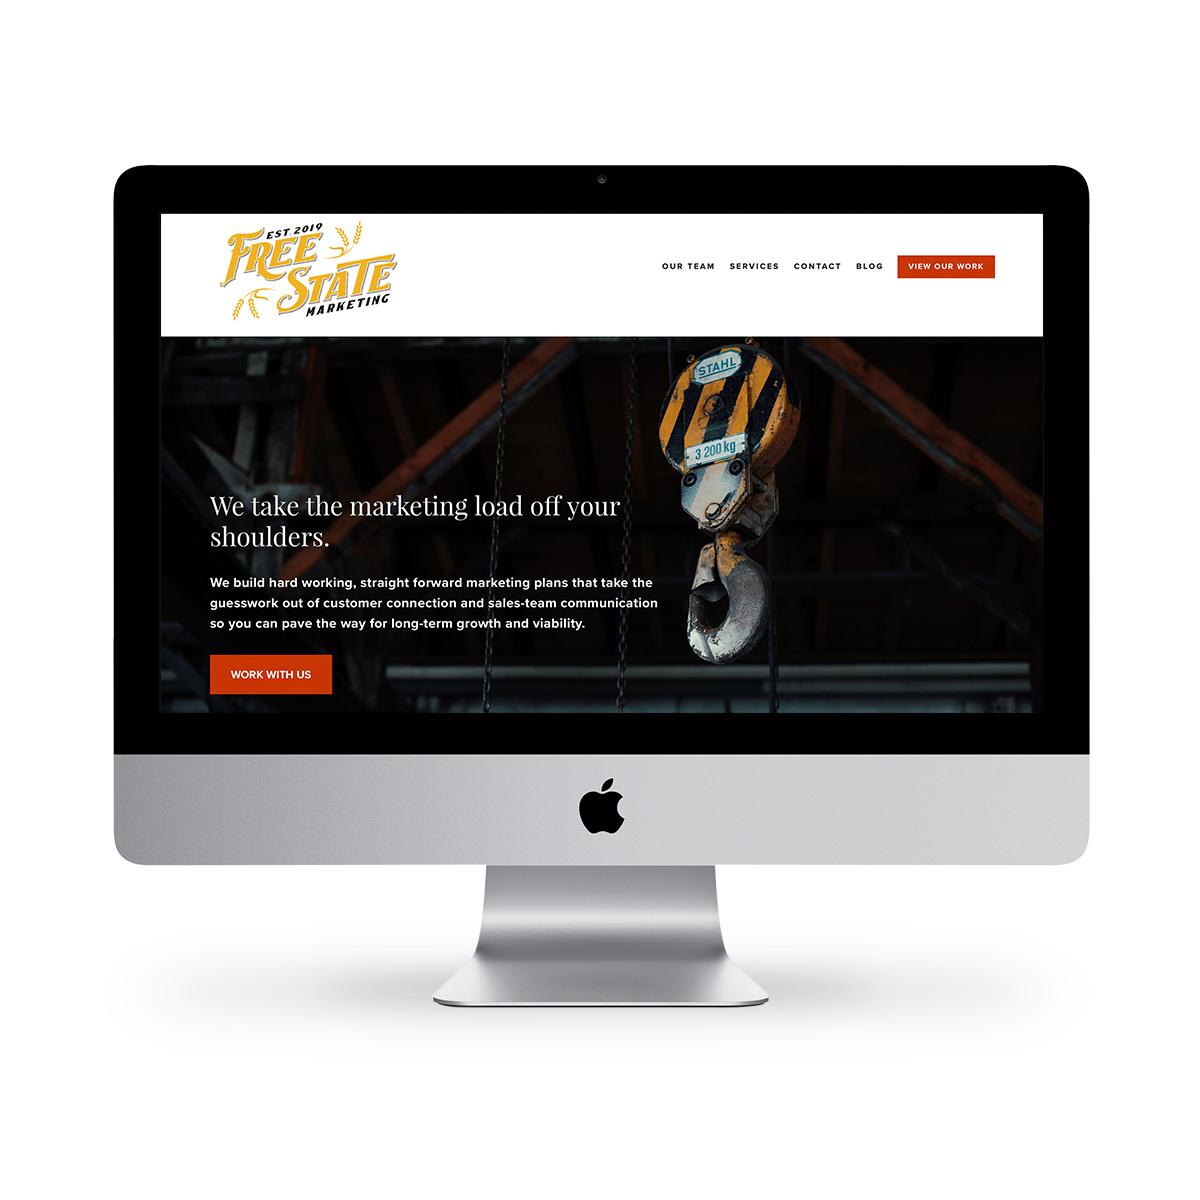 Free State Marketing LLC website